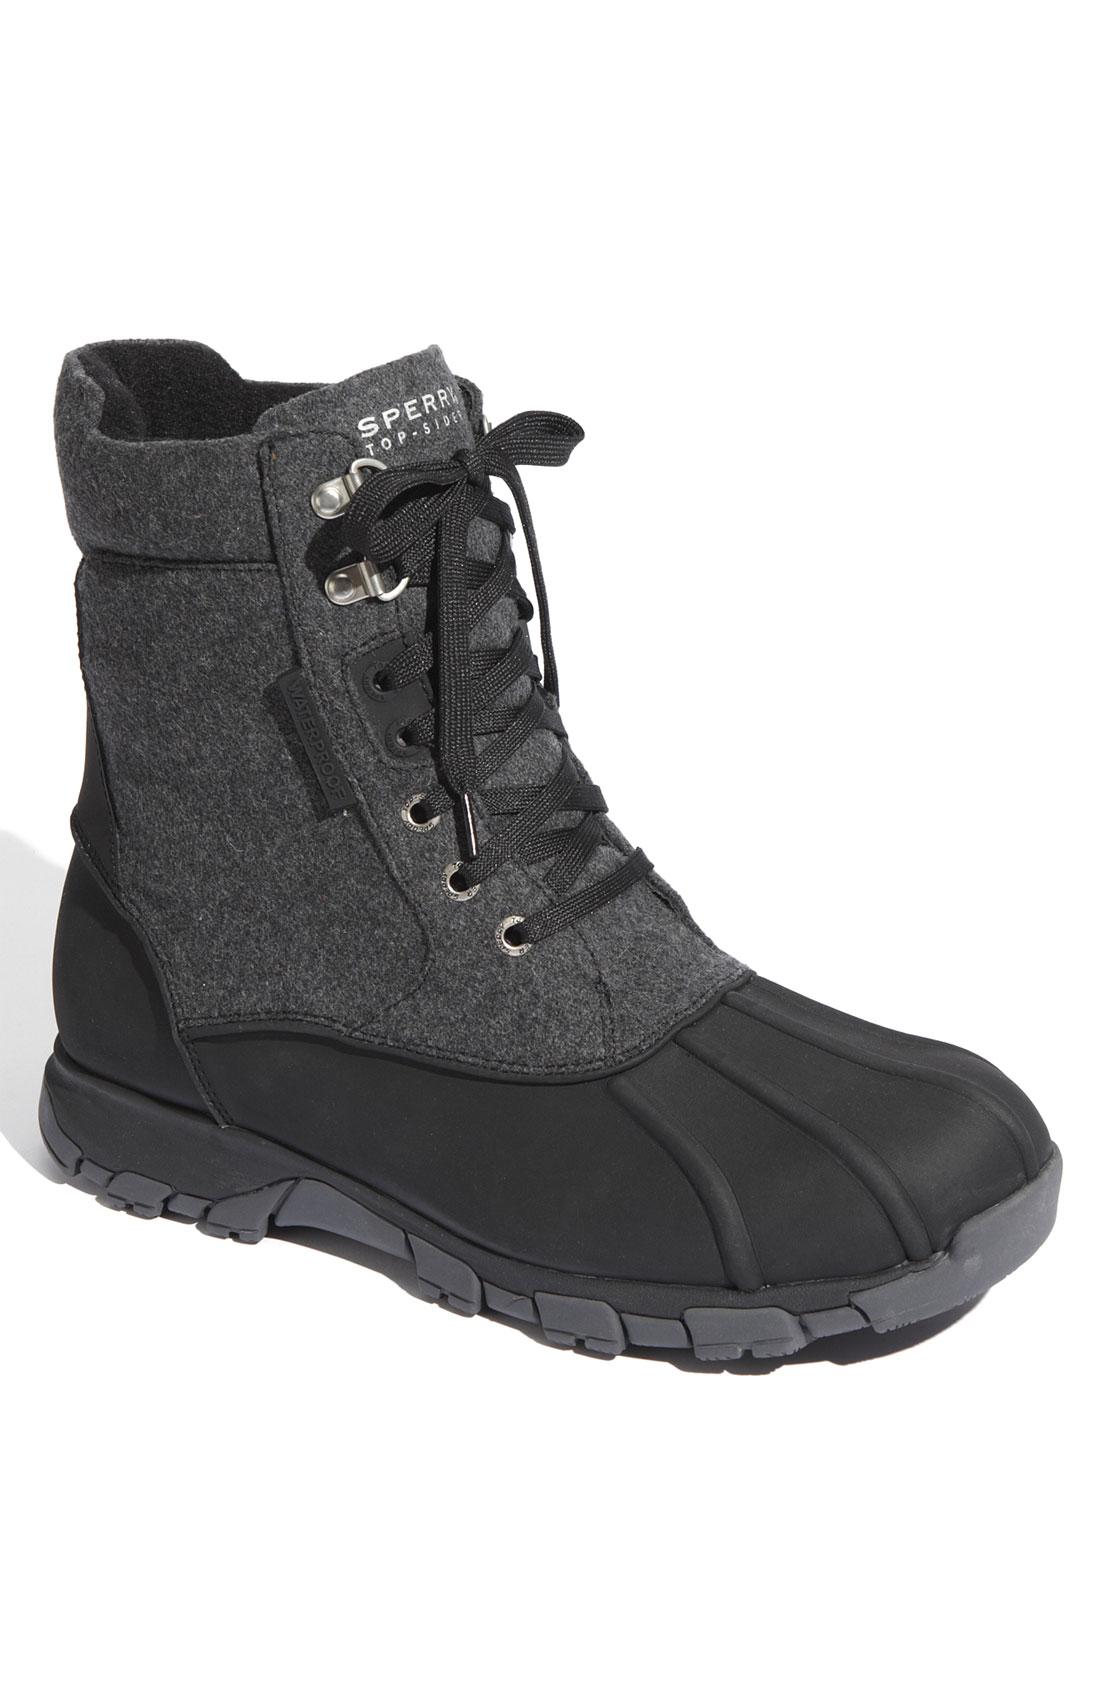 Sperry Top Sider Wetlands Boot In Gray For Men Grey Wool